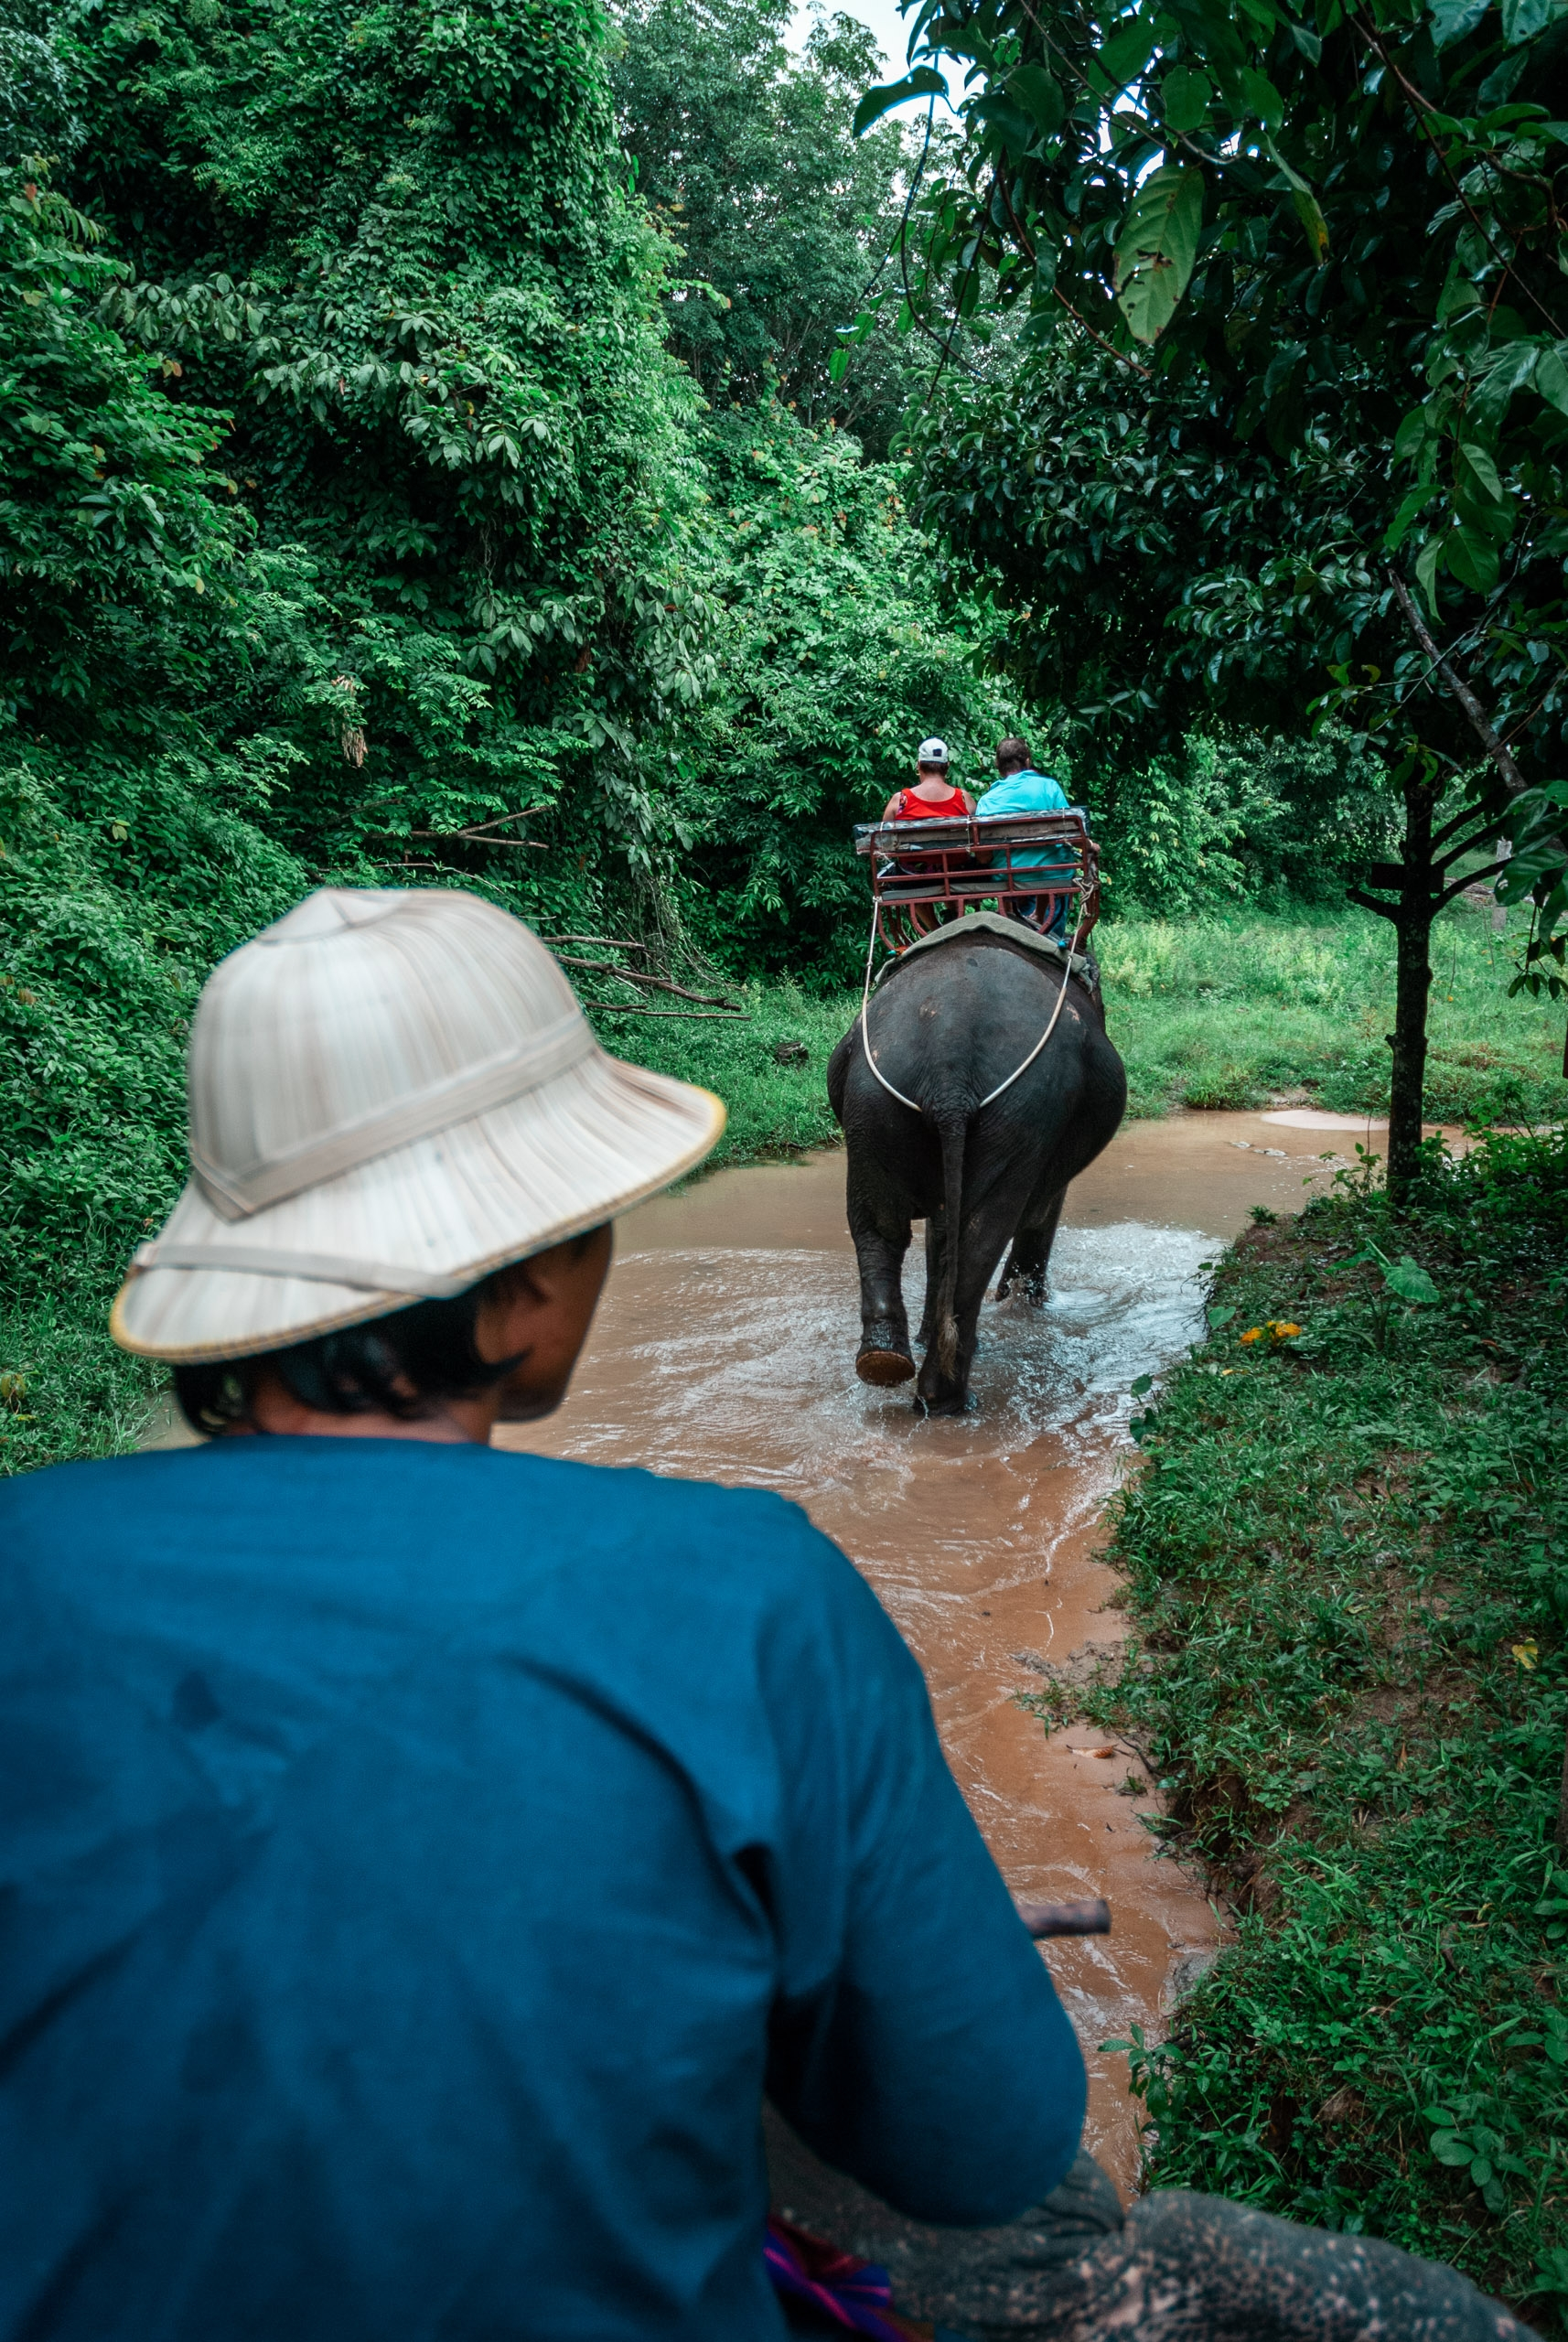 Riding an Elephant at the Elephant Reserve